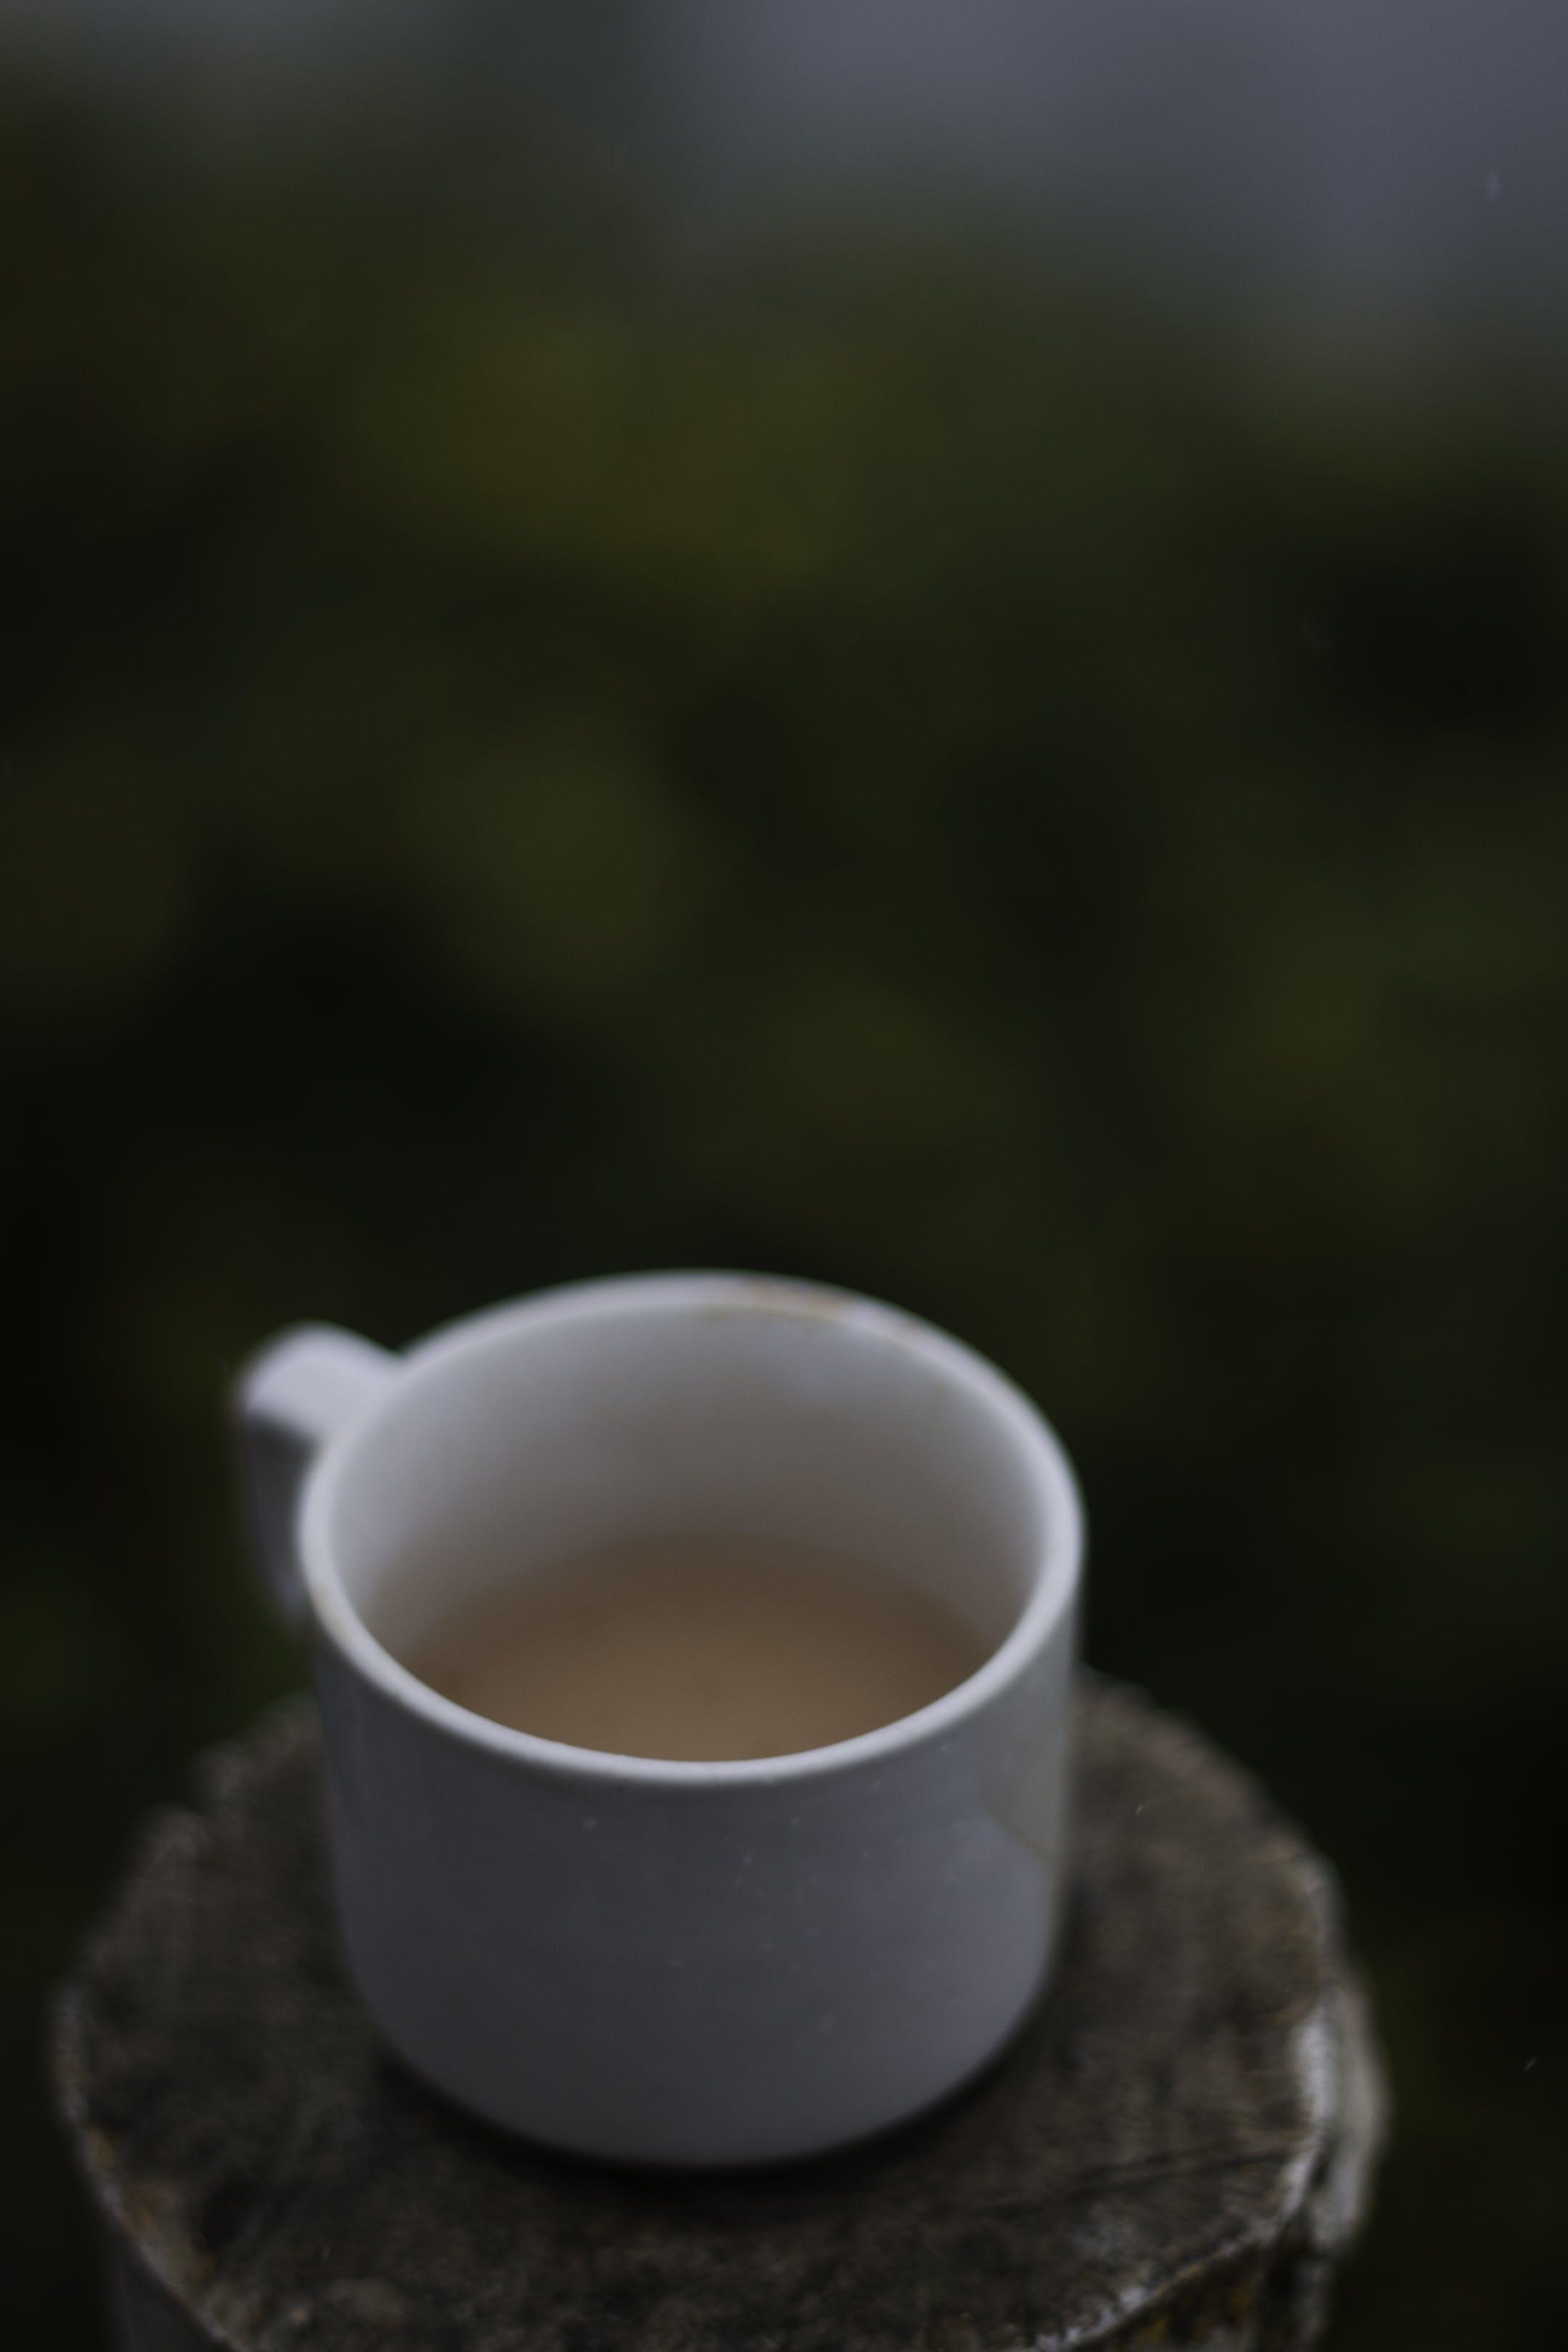 Free stock photo of #tea #cup #mist #fog #nature